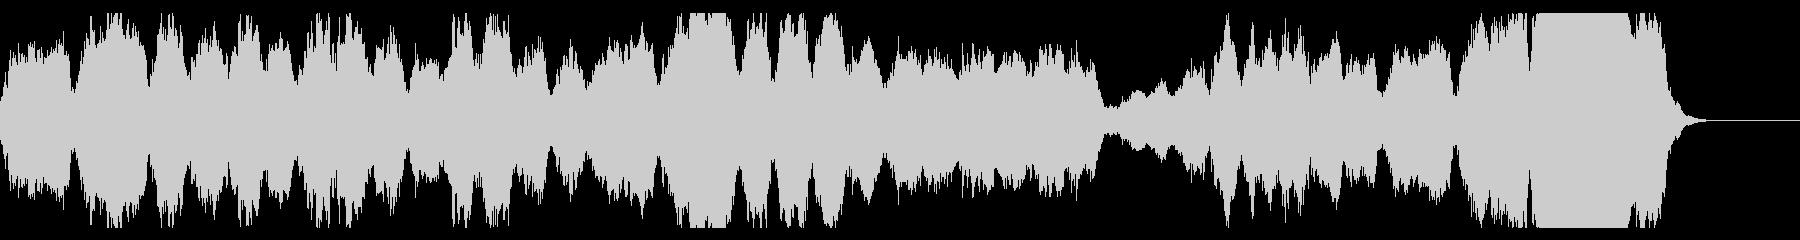 TVでよく使われるクラシック 展覧会の絵の未再生の波形